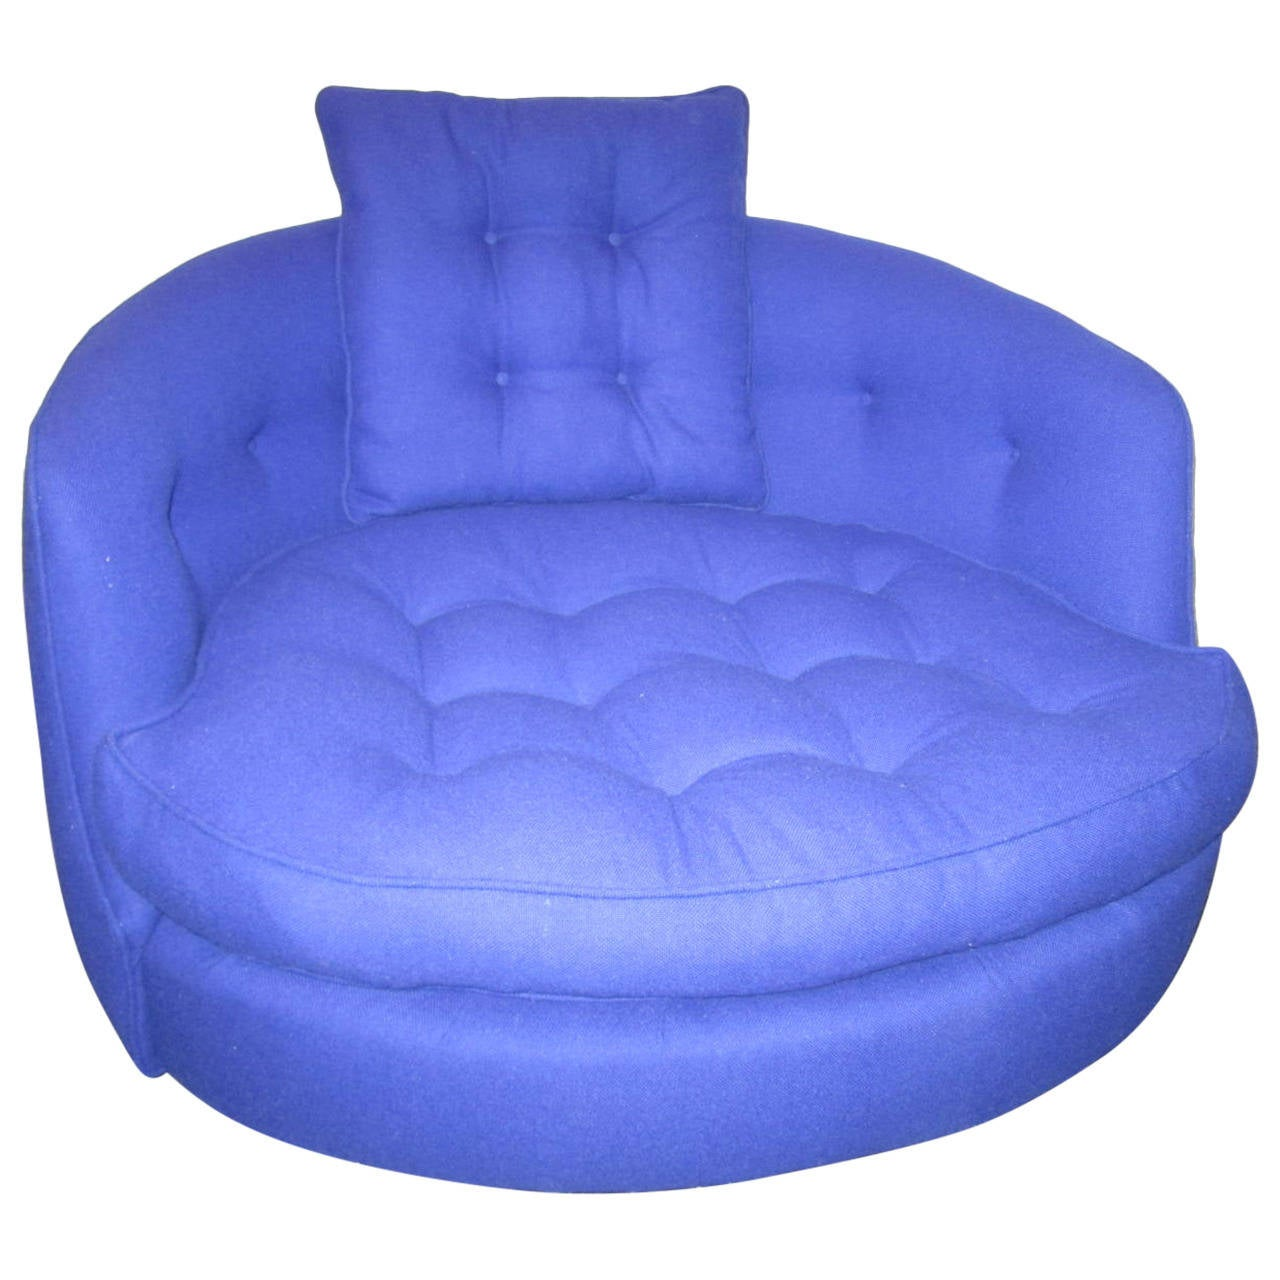 Fabulous oversized round circular milo baughman swivel lounge chair at